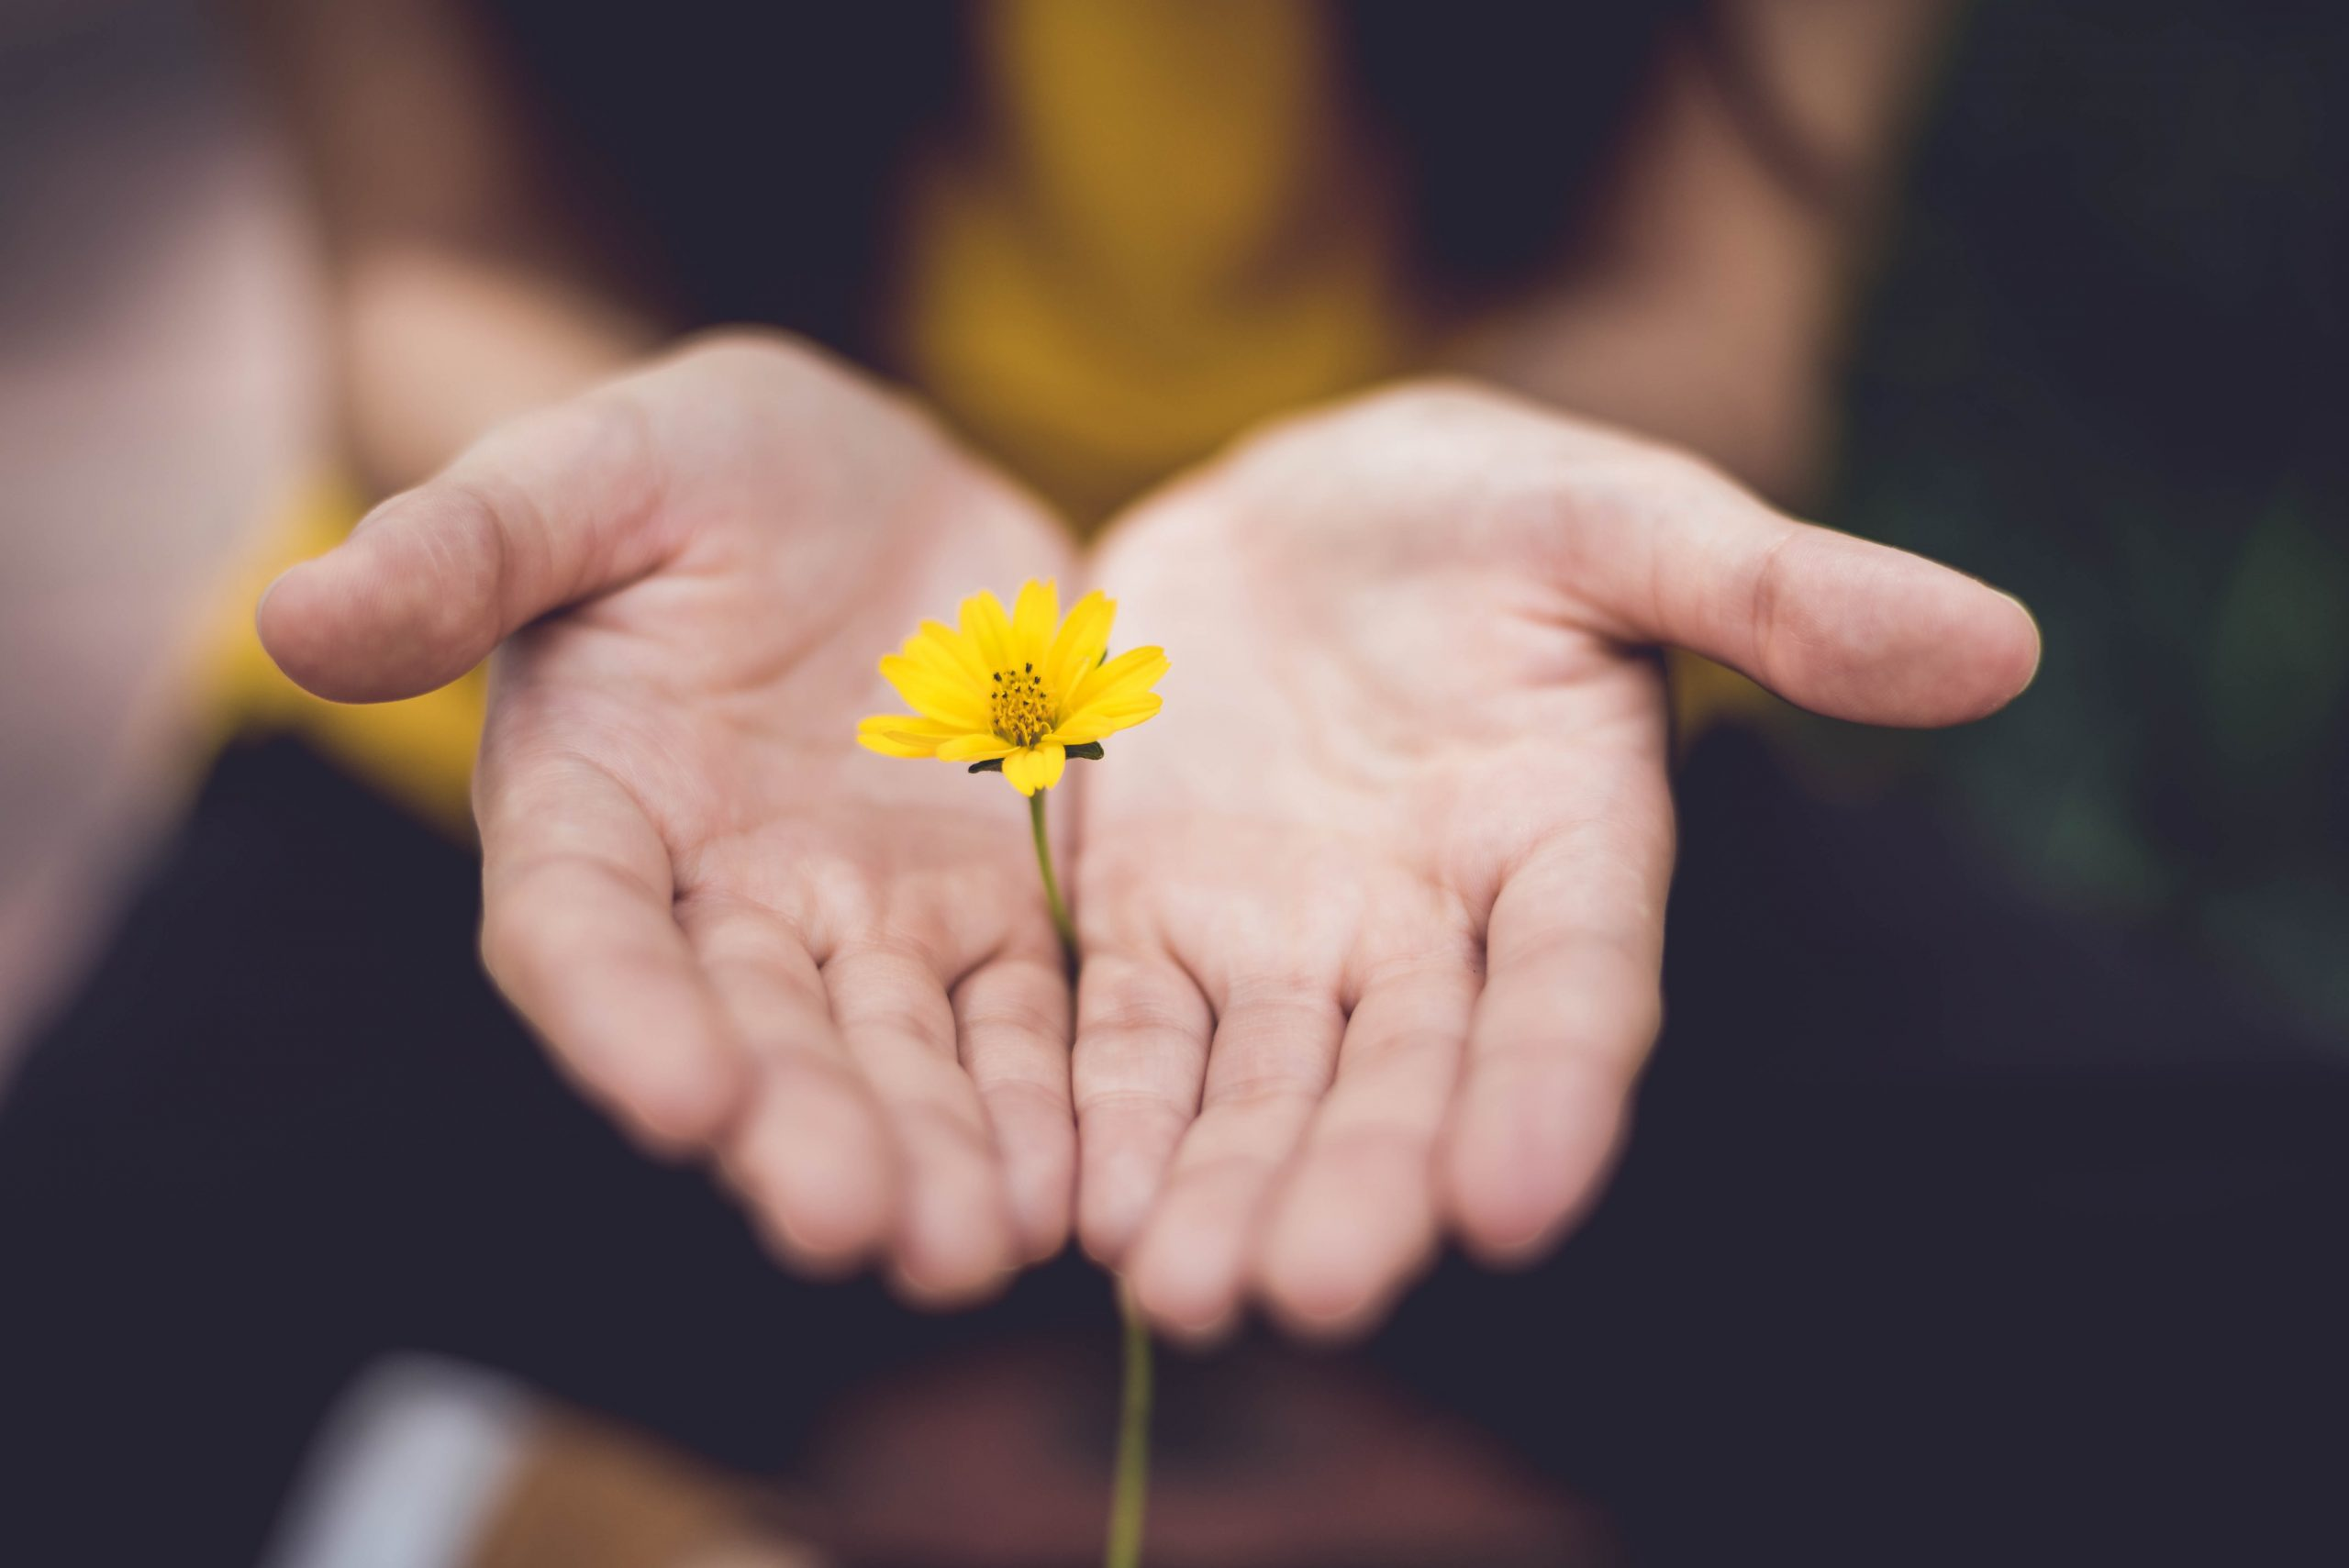 Hands holding flower